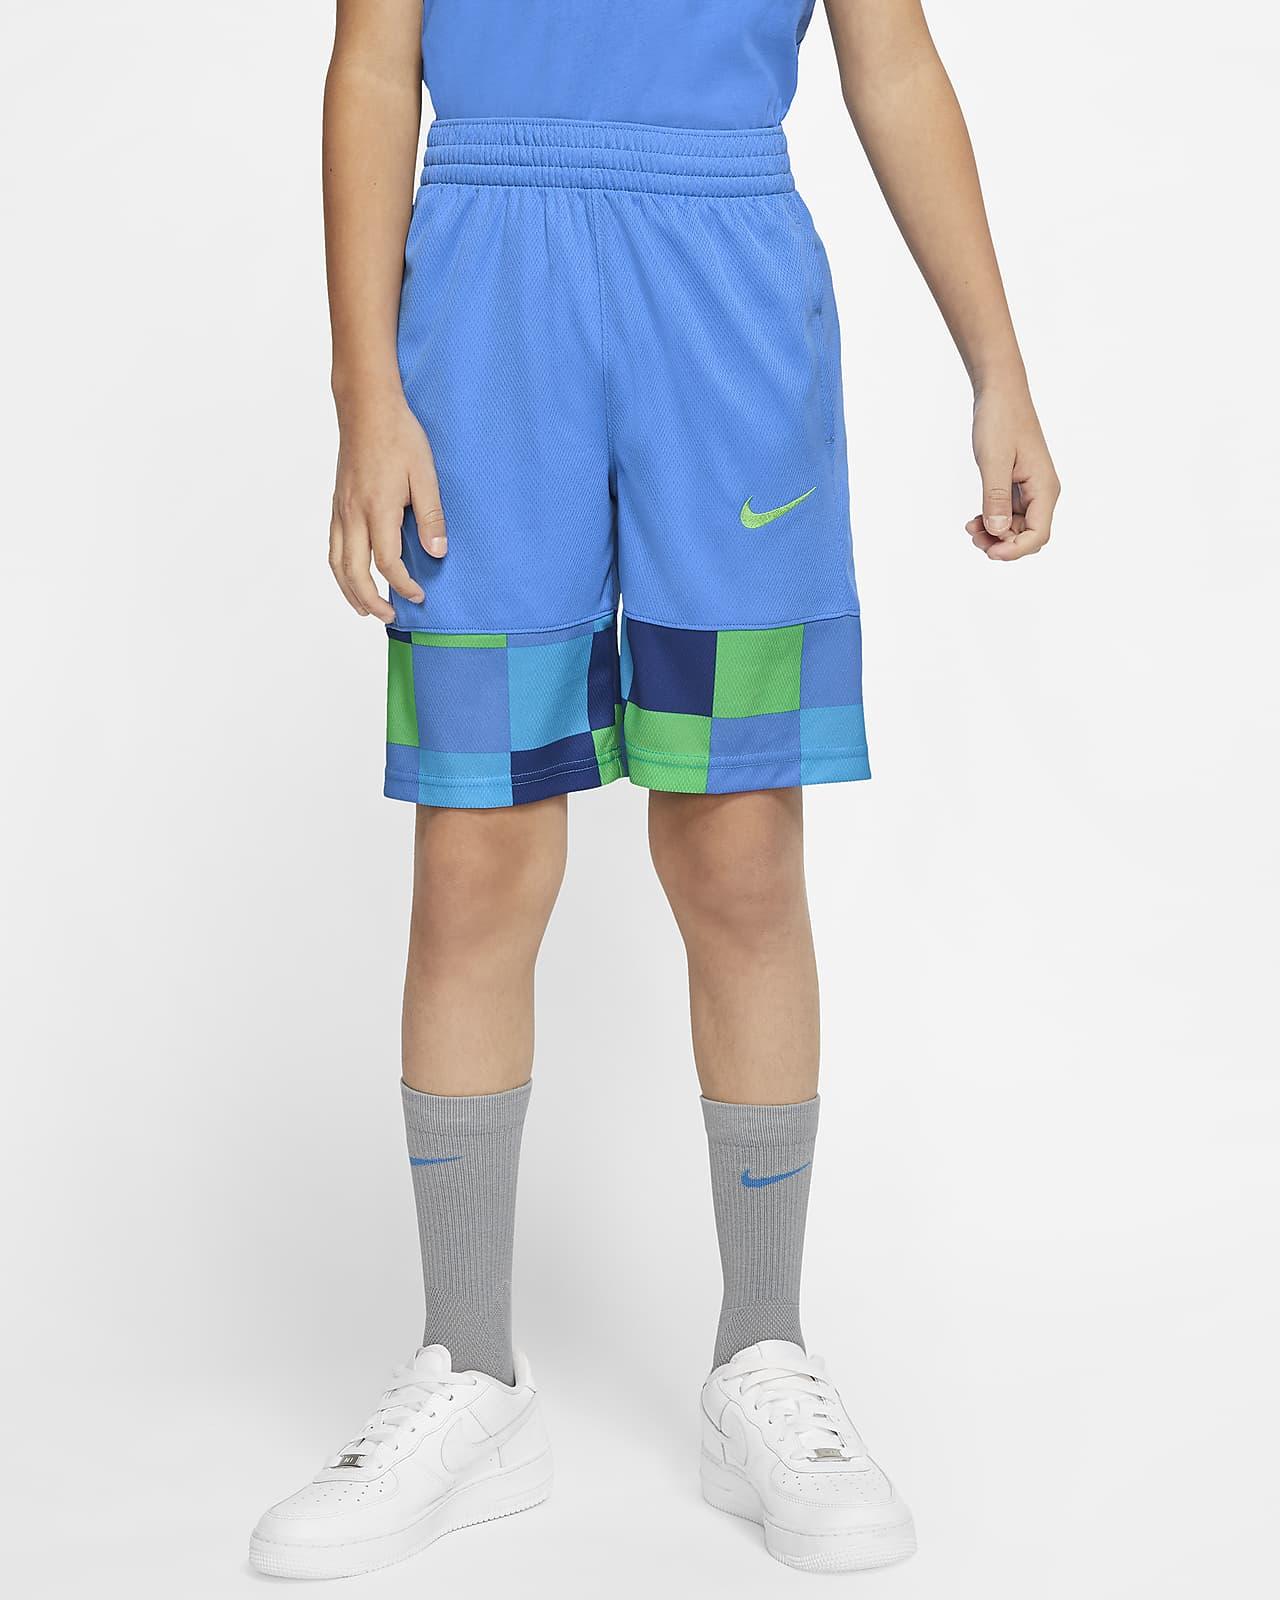 Nike Older Kids' (Boys') Basketball